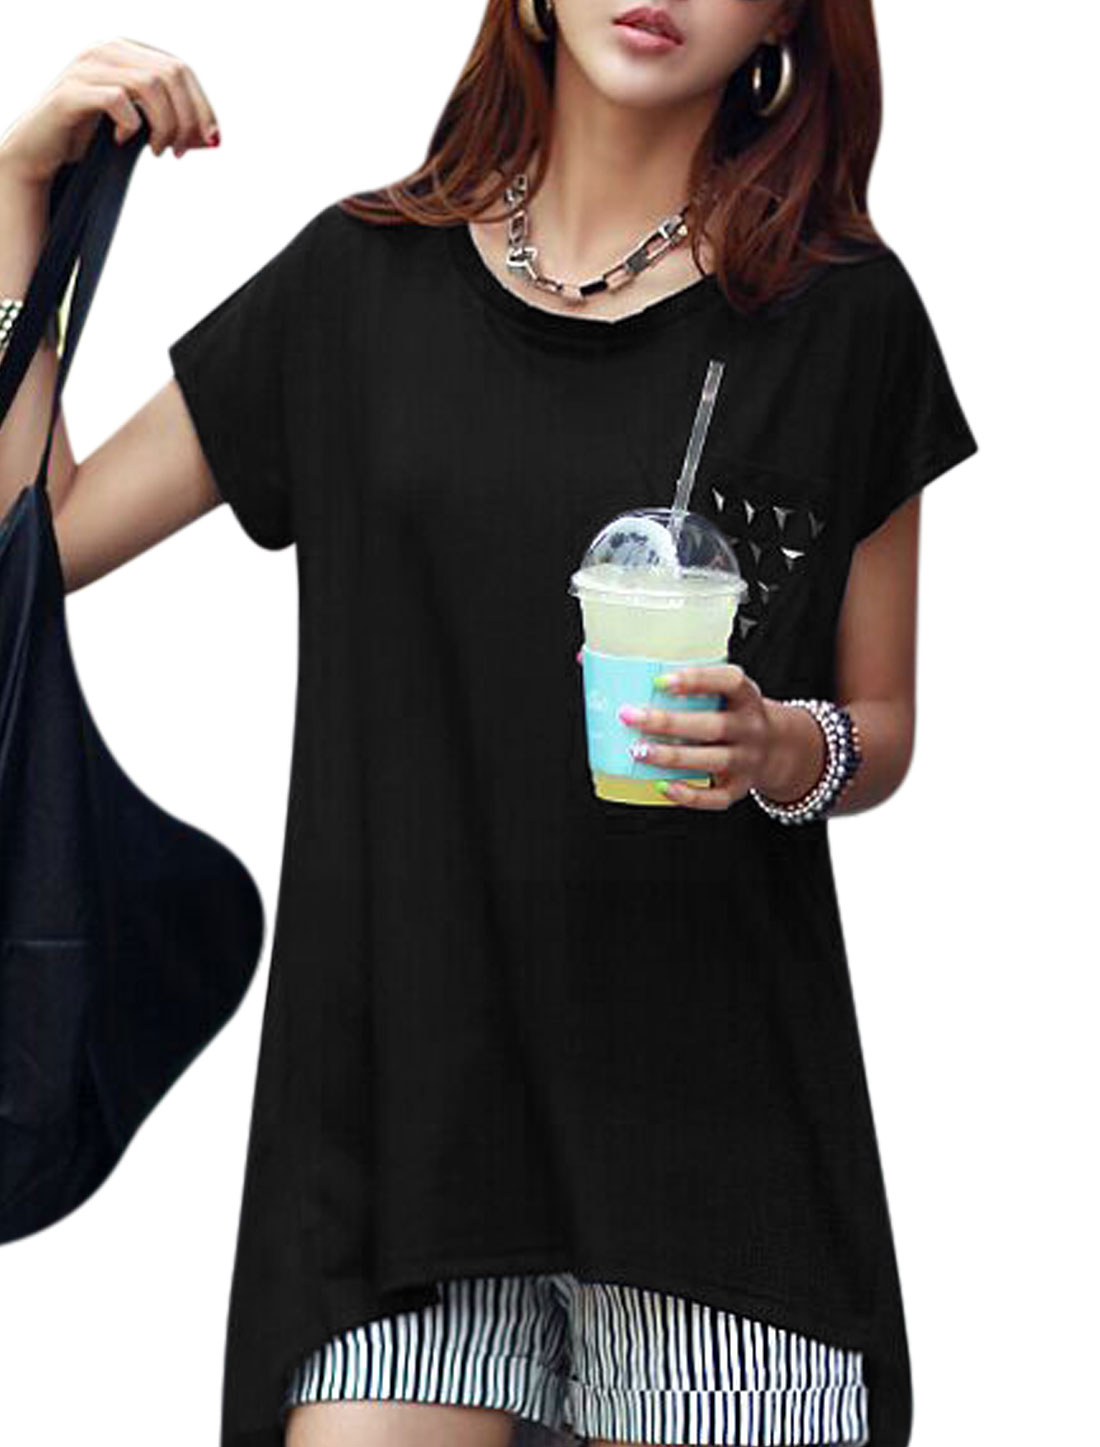 Ladies Stud Short Dolman Sleeves Low High Hem Tunic Shirts Black XS